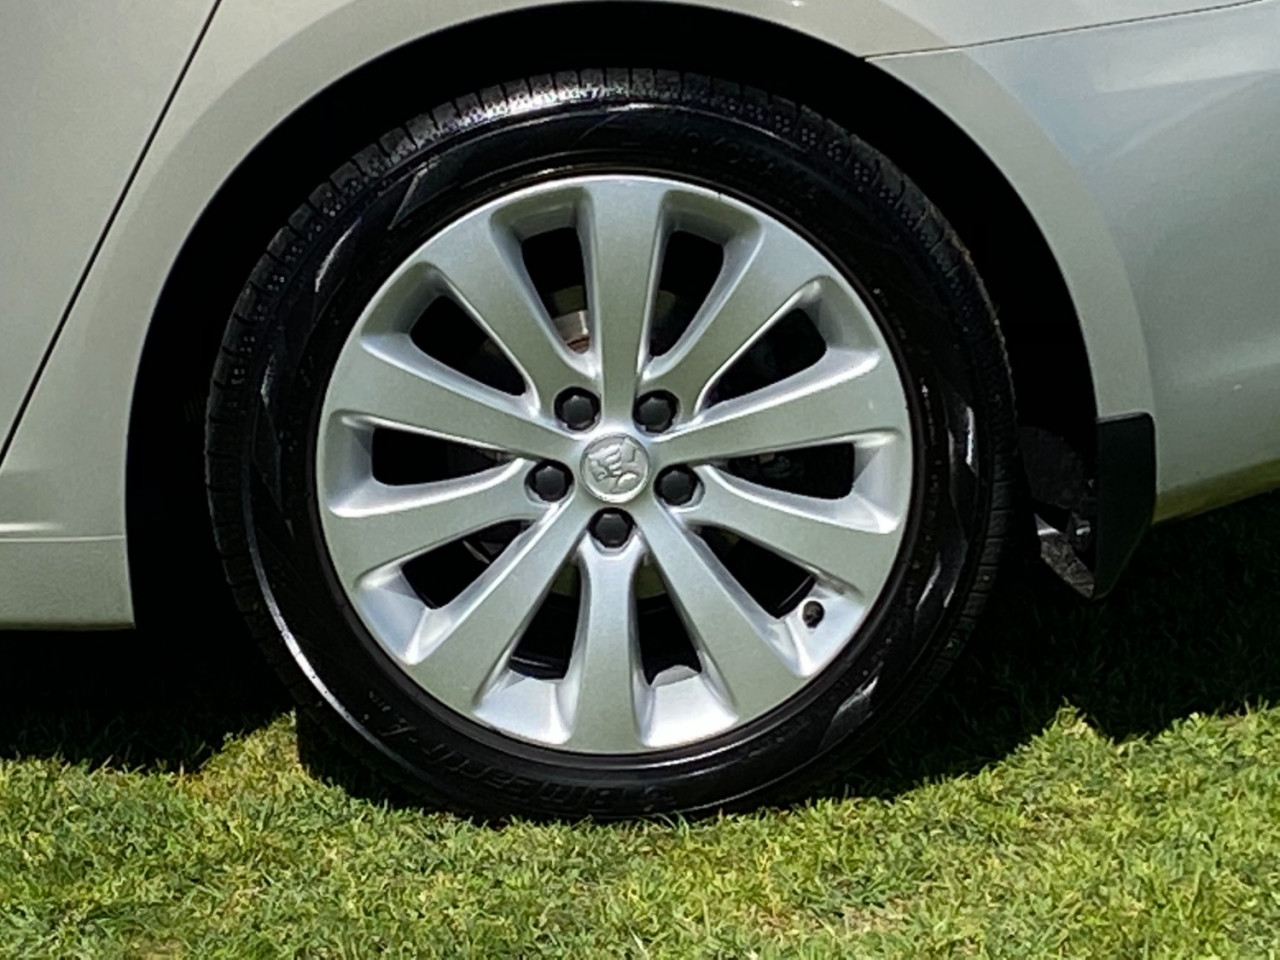 2012 Holden Cruze JH SERIES II MY12 CDX Hatchback Image 2